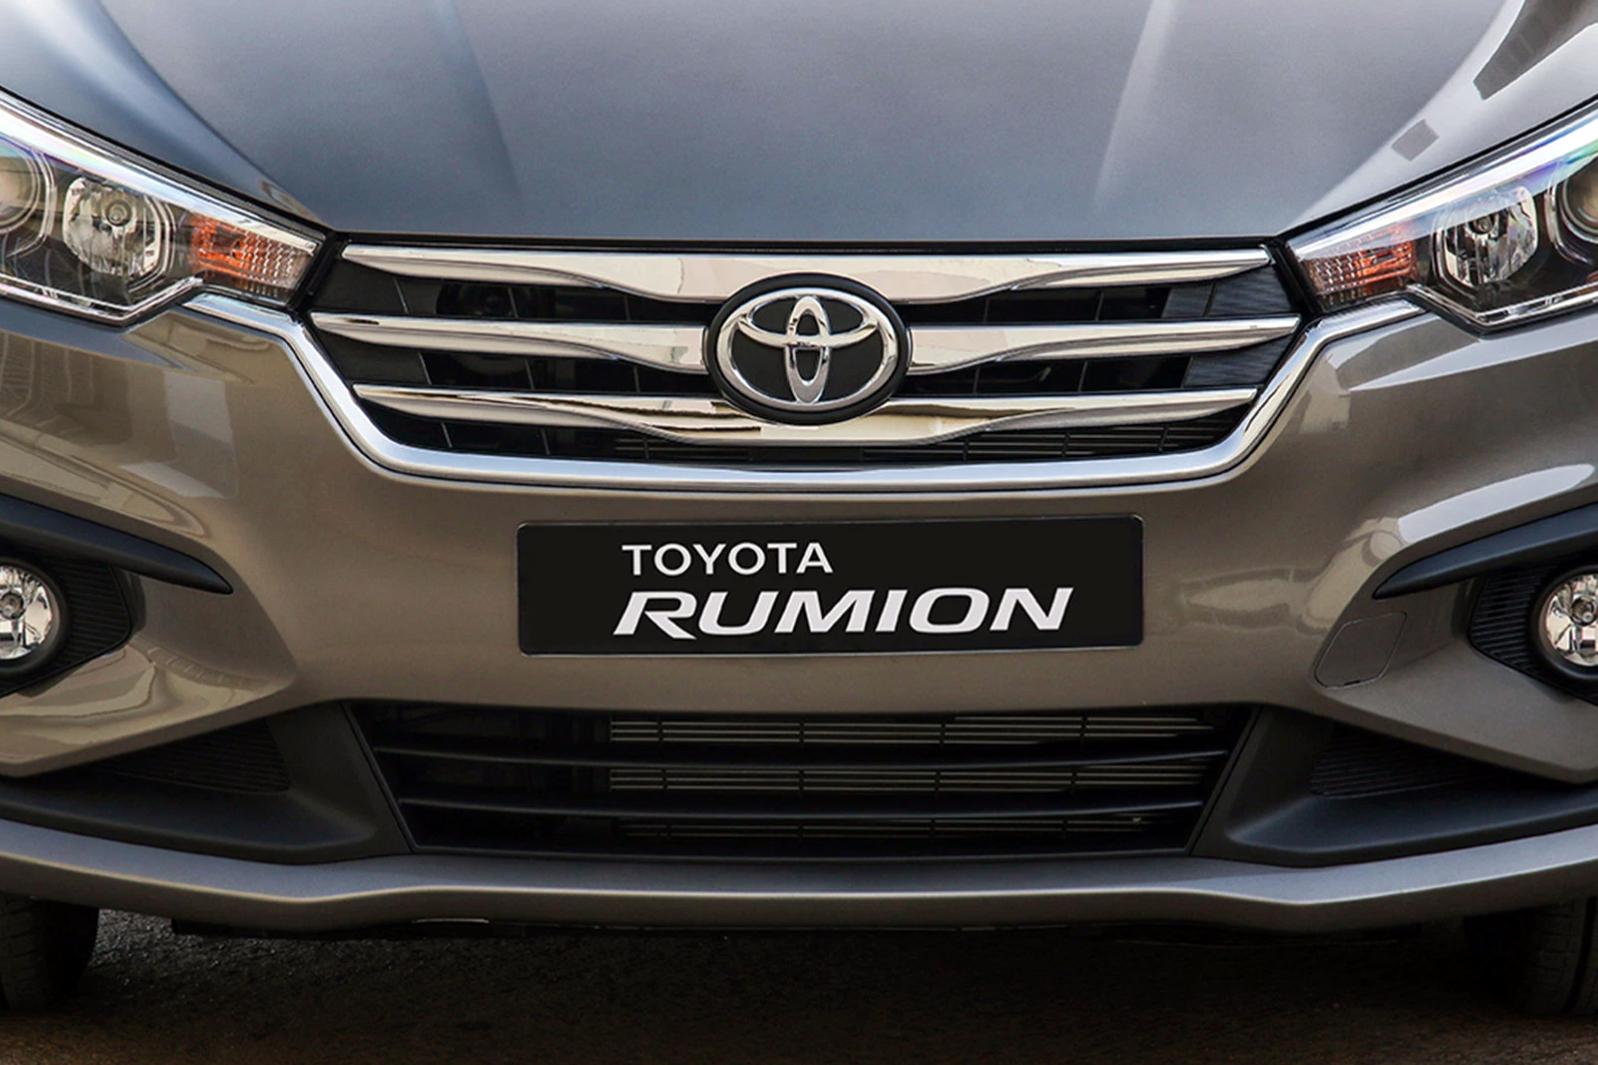 Toyota gắn logo lên Suzuki Ertiga, có giúp cả hai đổi vận? - ảnh 3